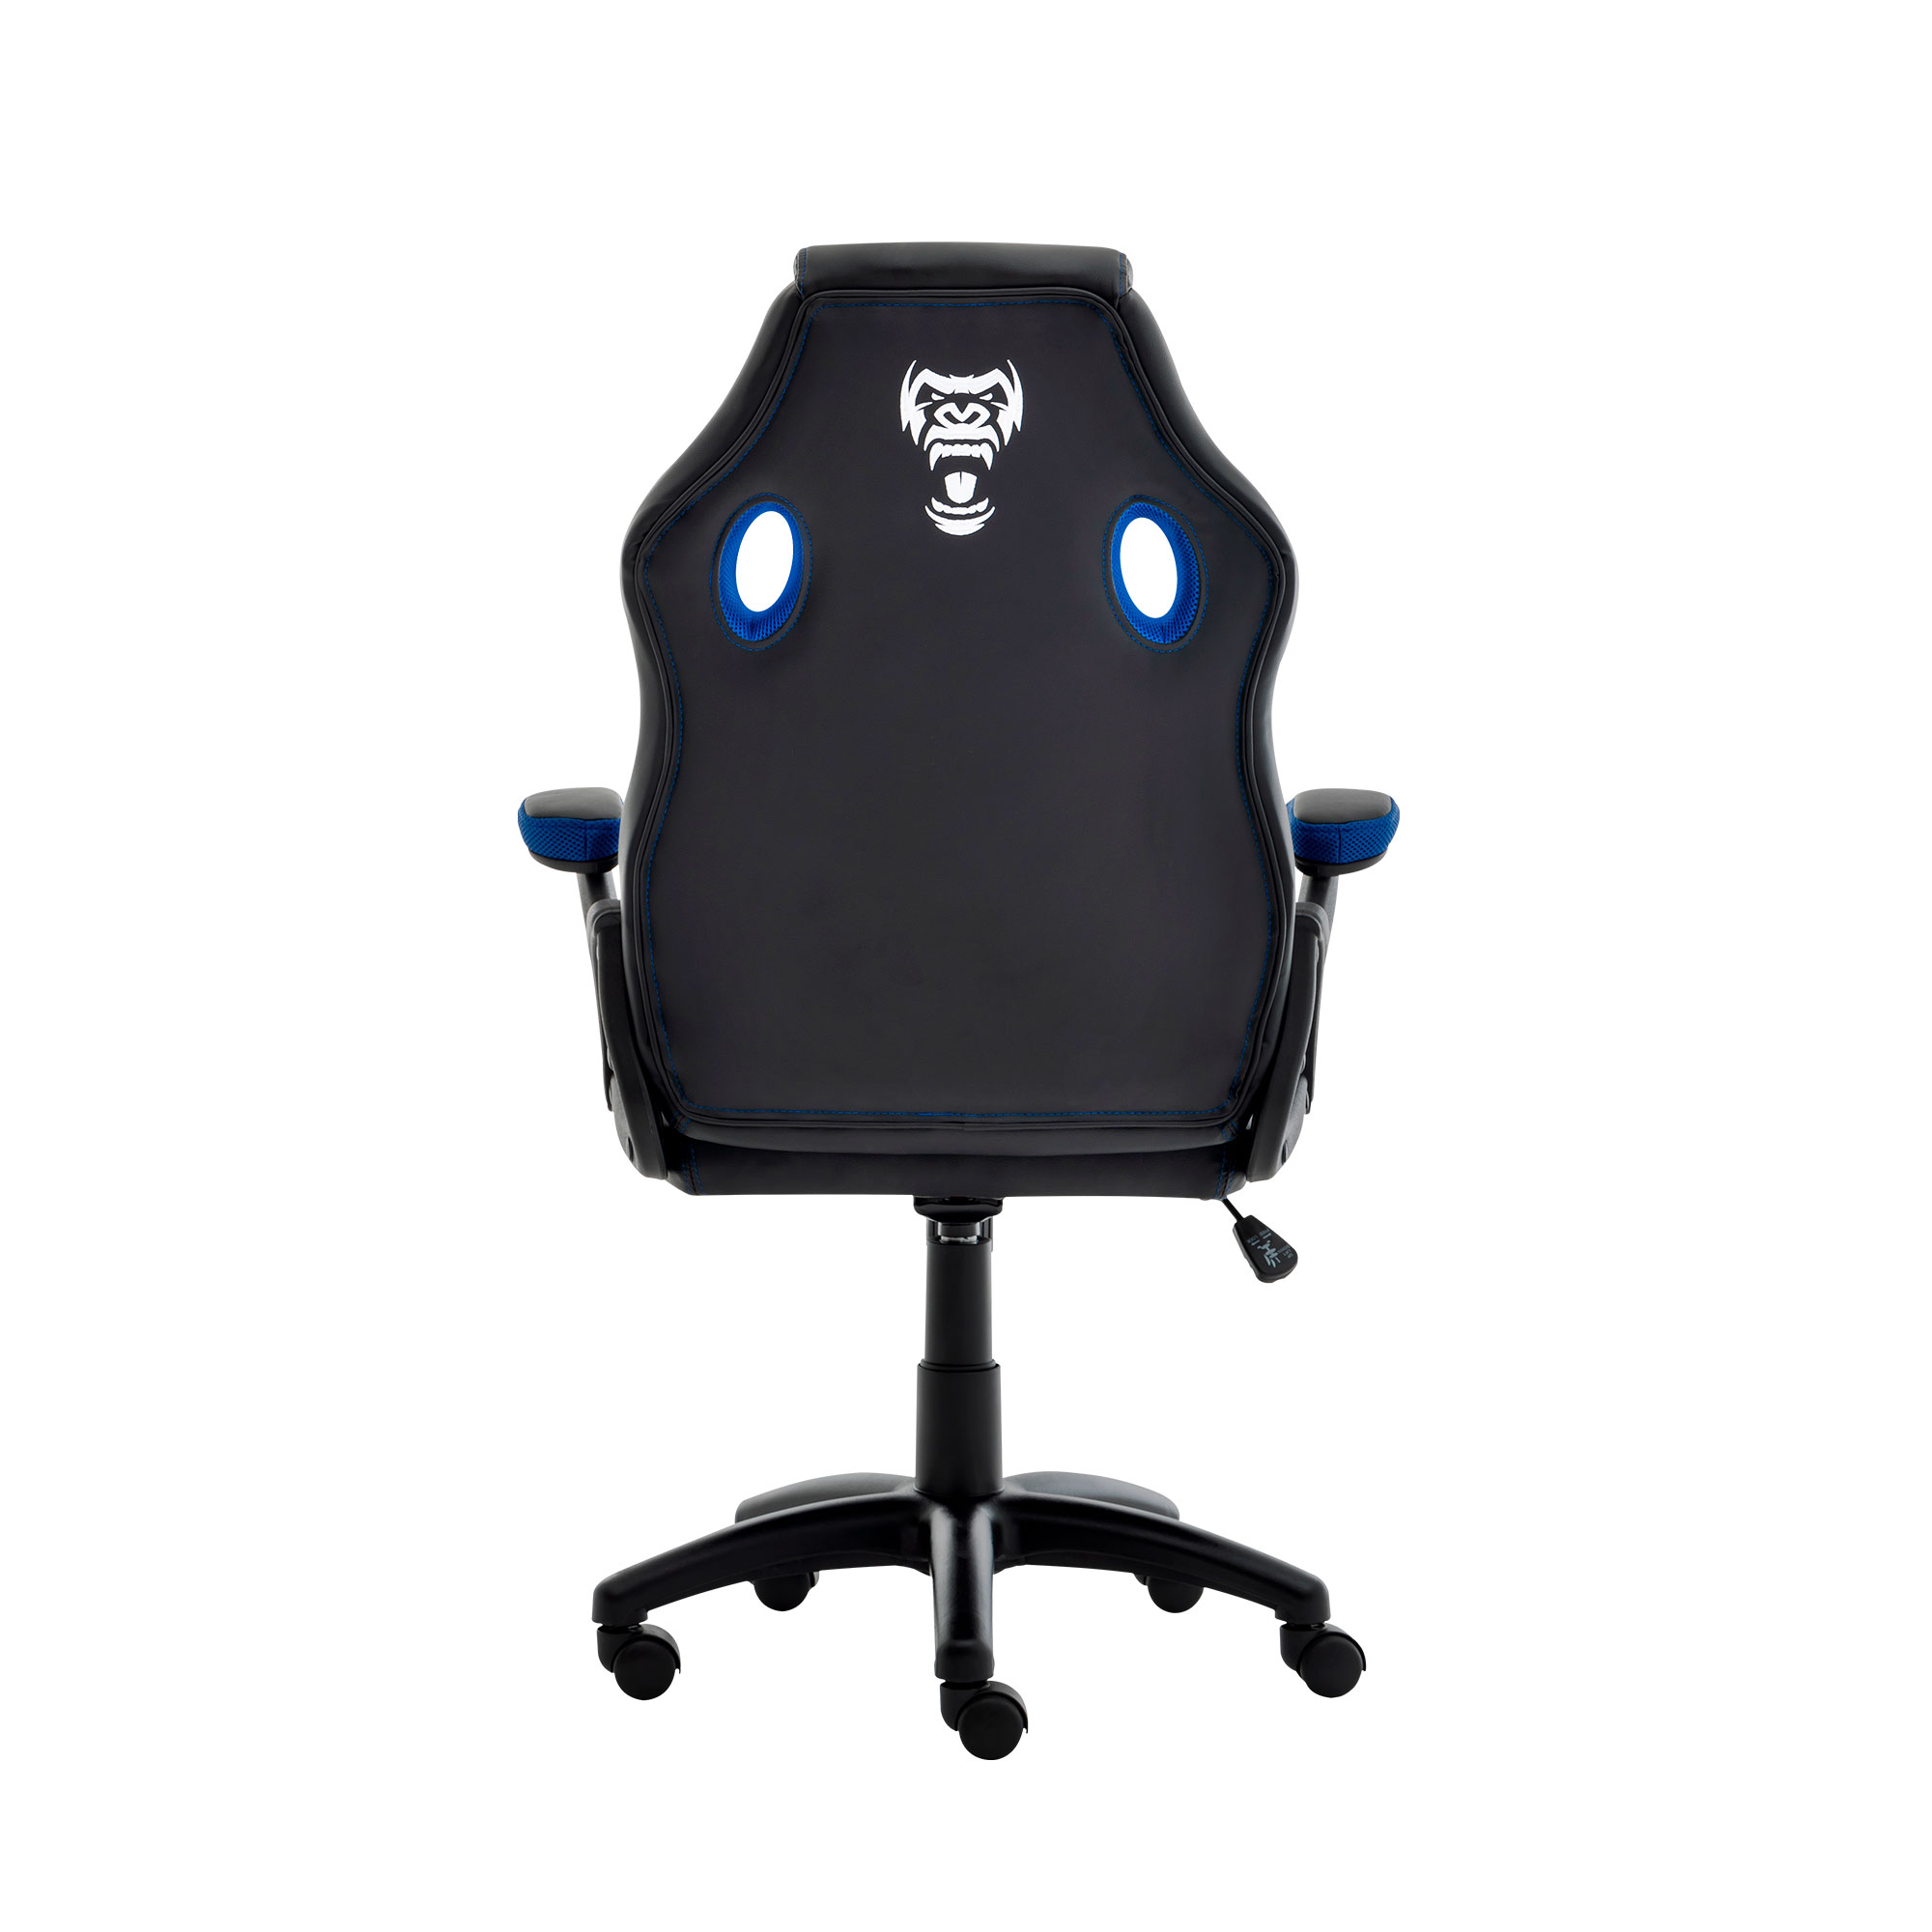 Cadeira Gamer Jungle Black/blue Clanm